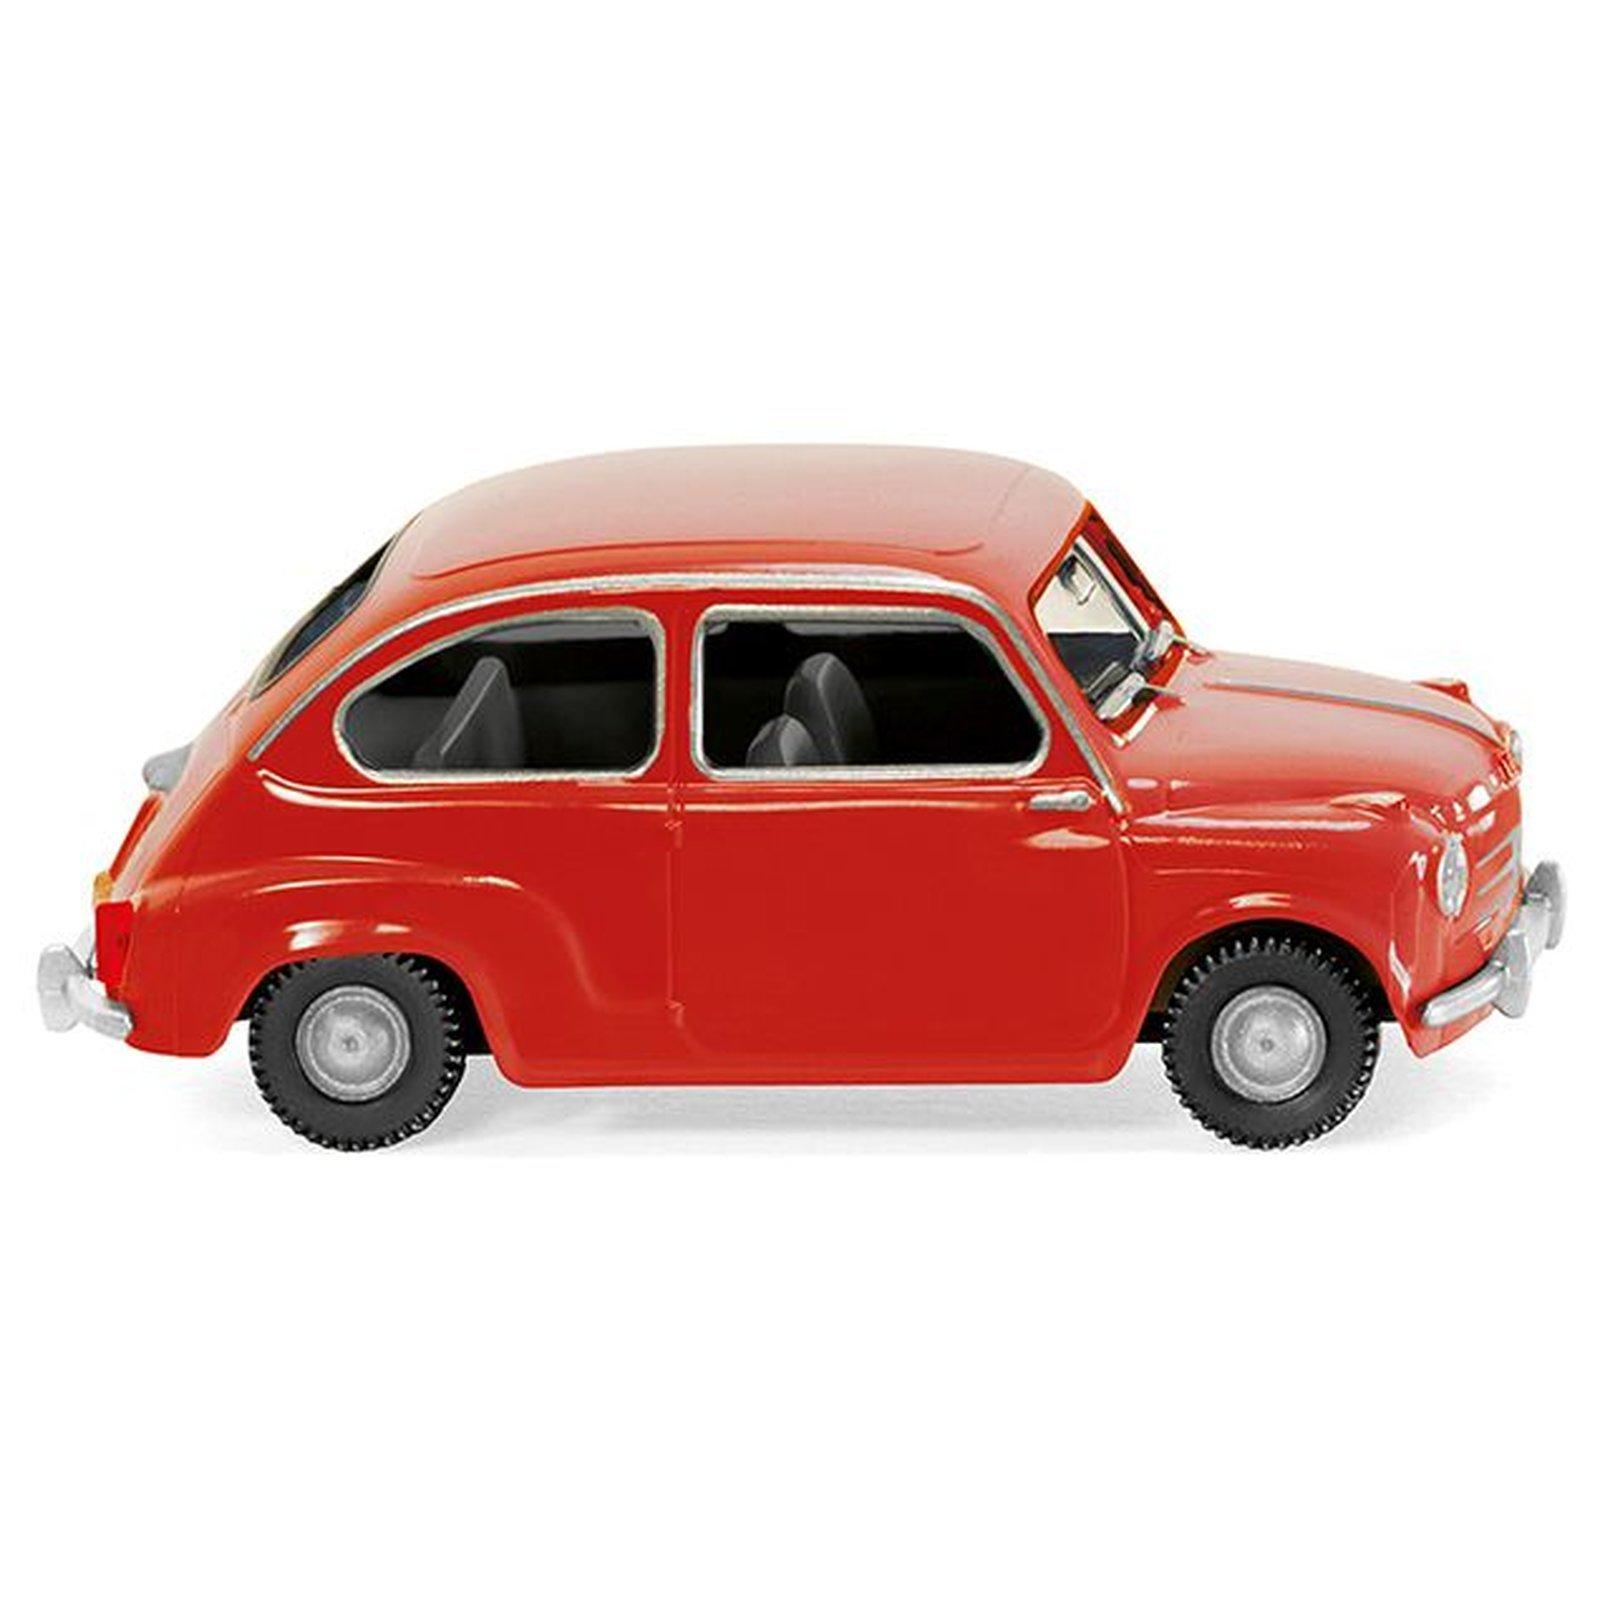 Fiat 600 rot WIKING 009904// 0099 04 H0, 1:87 NEUWARE